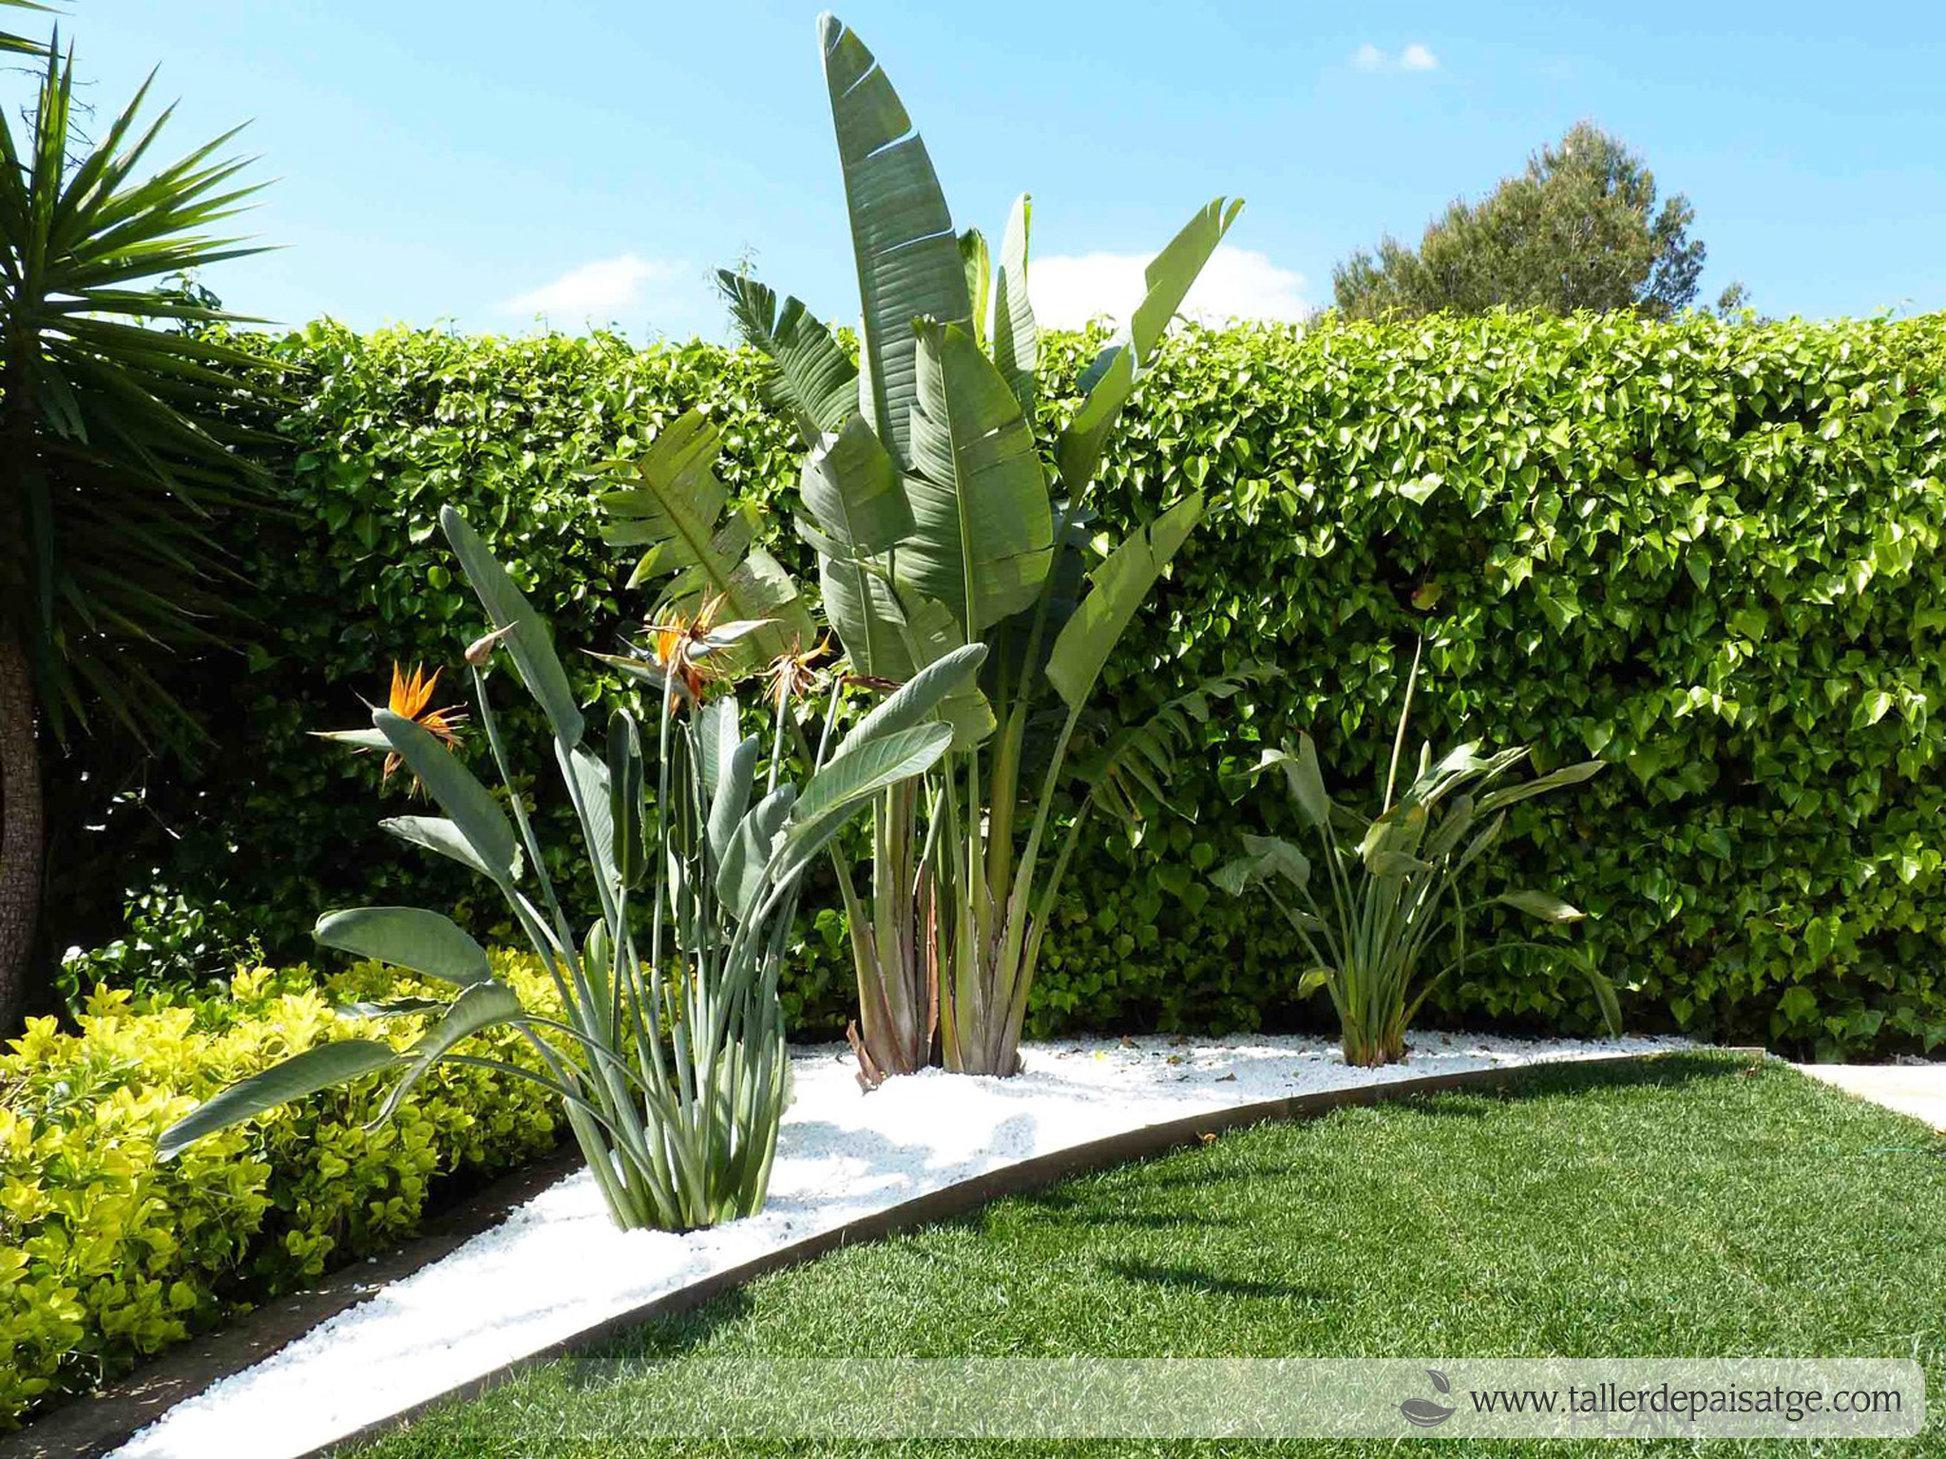 Piscina exterior jardin estilo tropical color verde for Paisajismo jardines con piscina